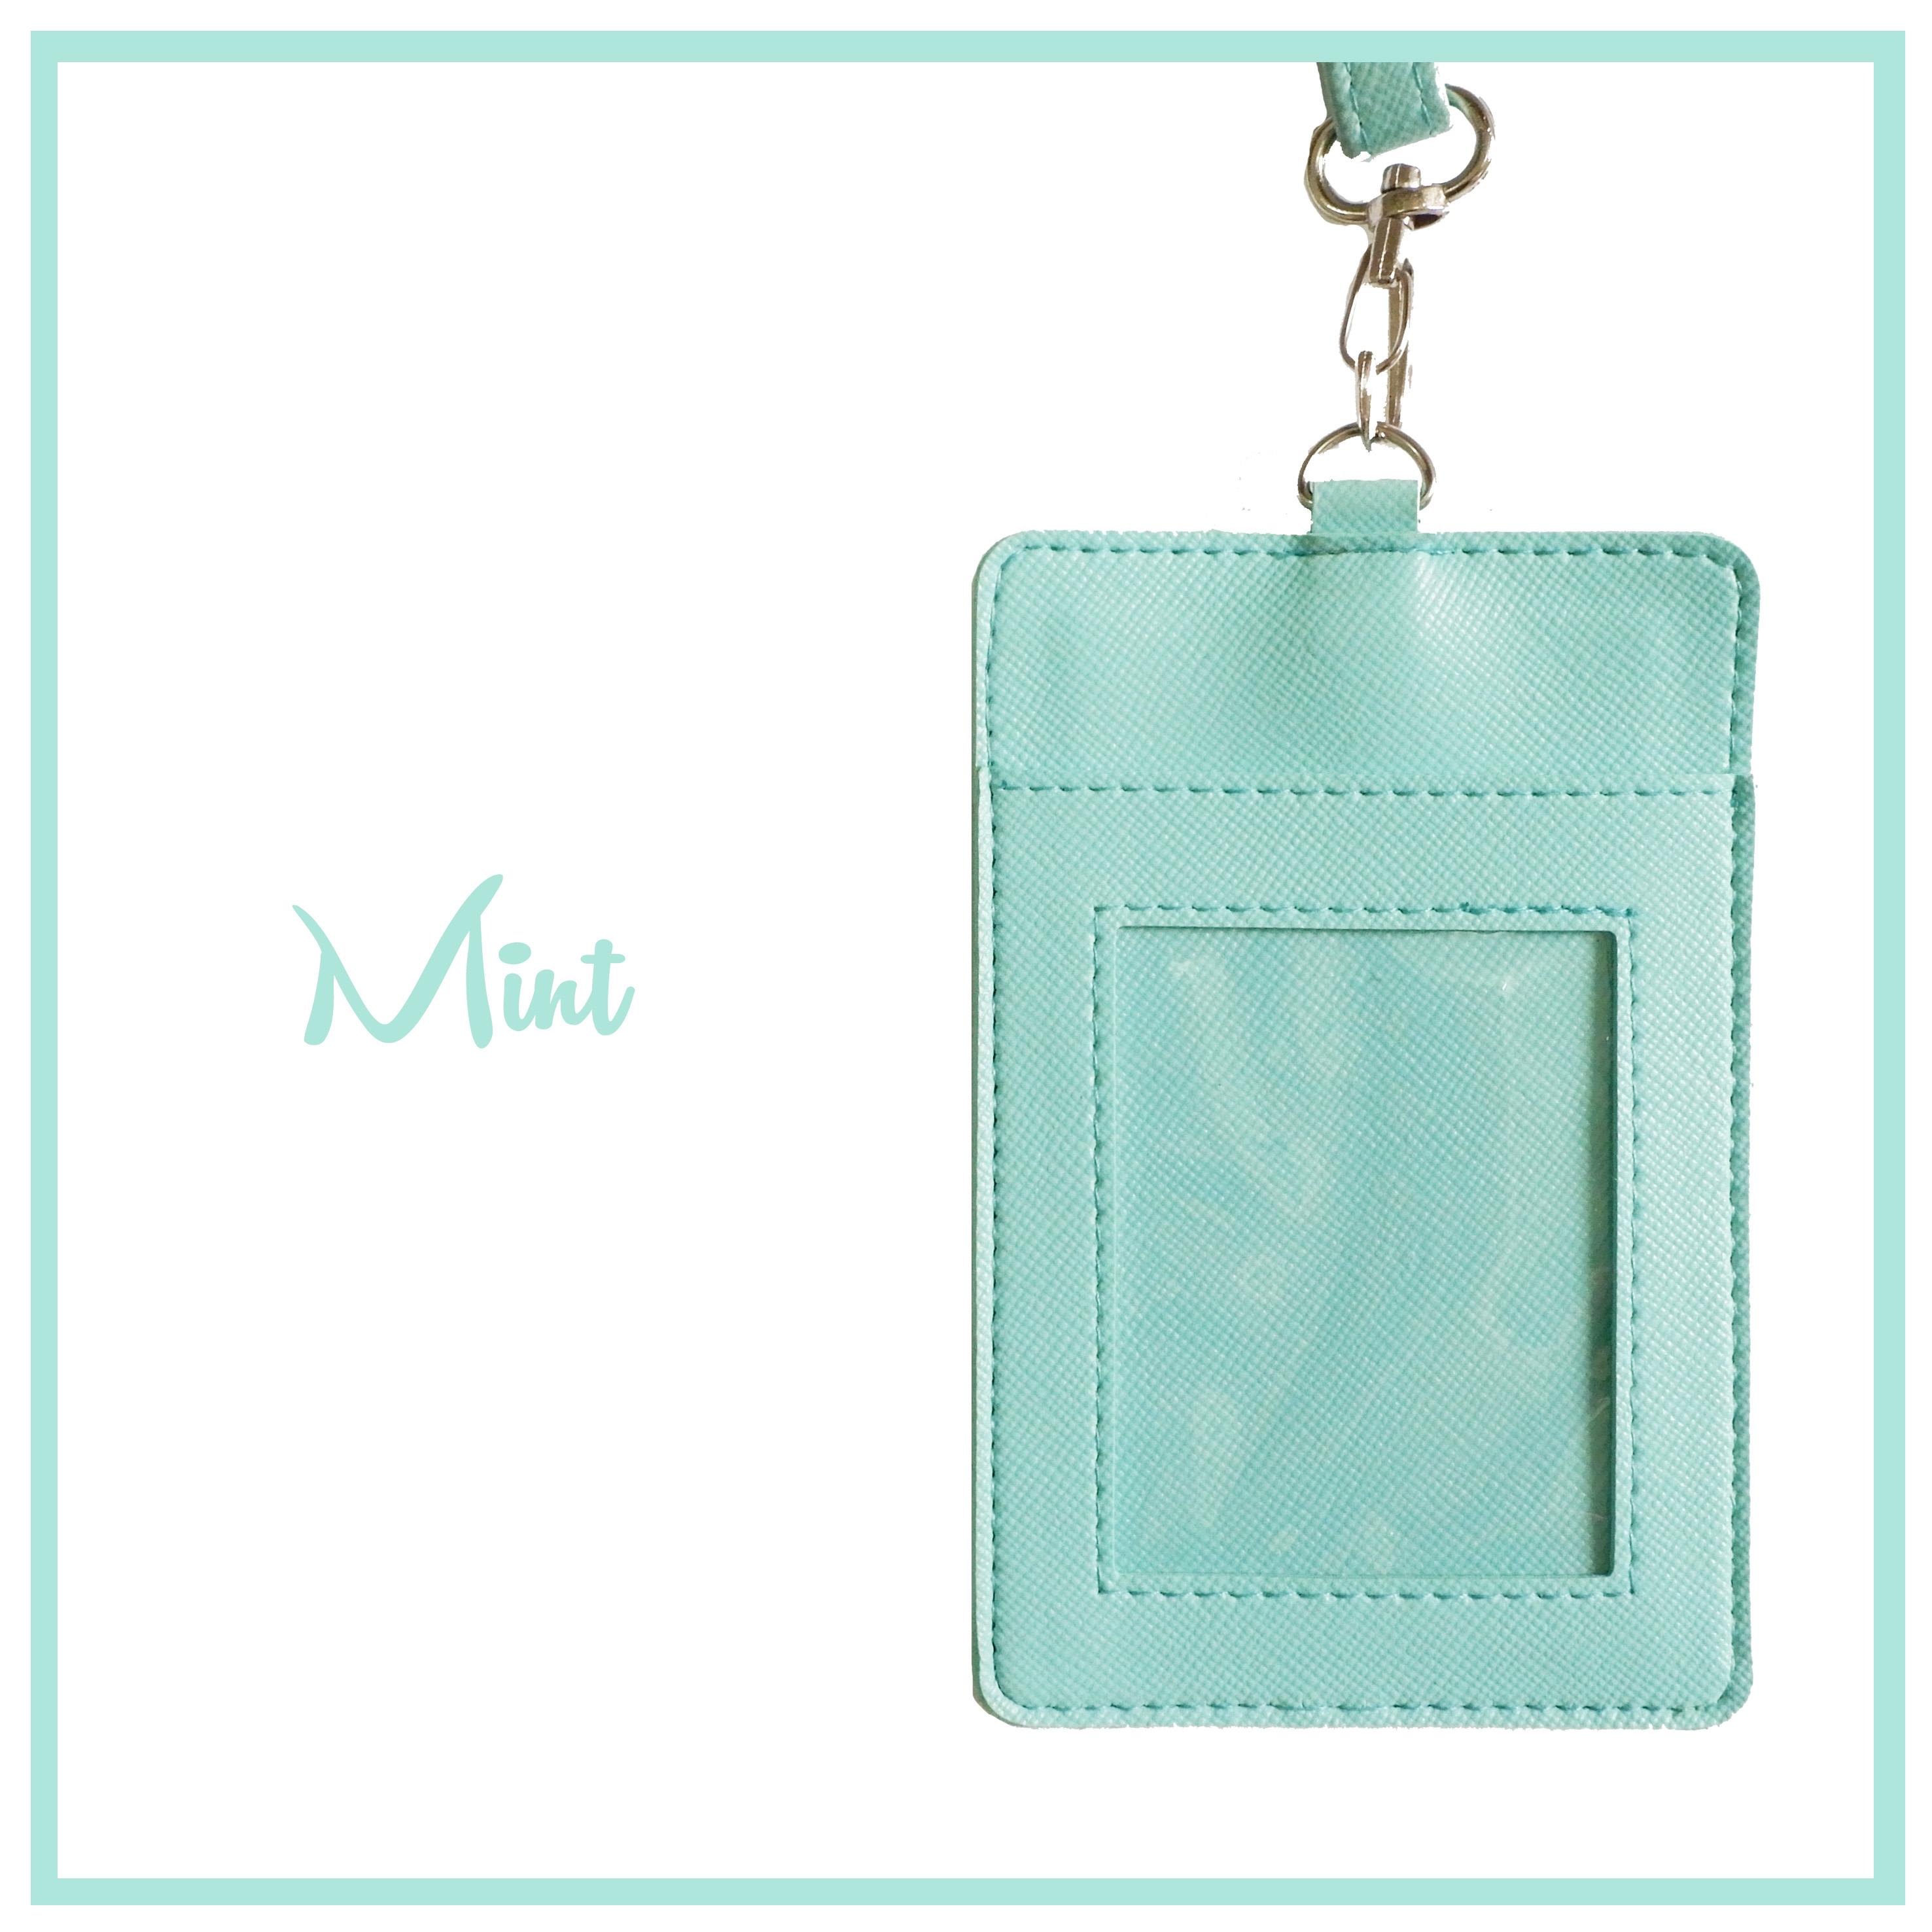 Foodandstuff Shop Line Kantong Mika Custom Mint Gantungan Tempat Sarung Kalung Kartu Id Card Name Tag Nama Holder Kulit